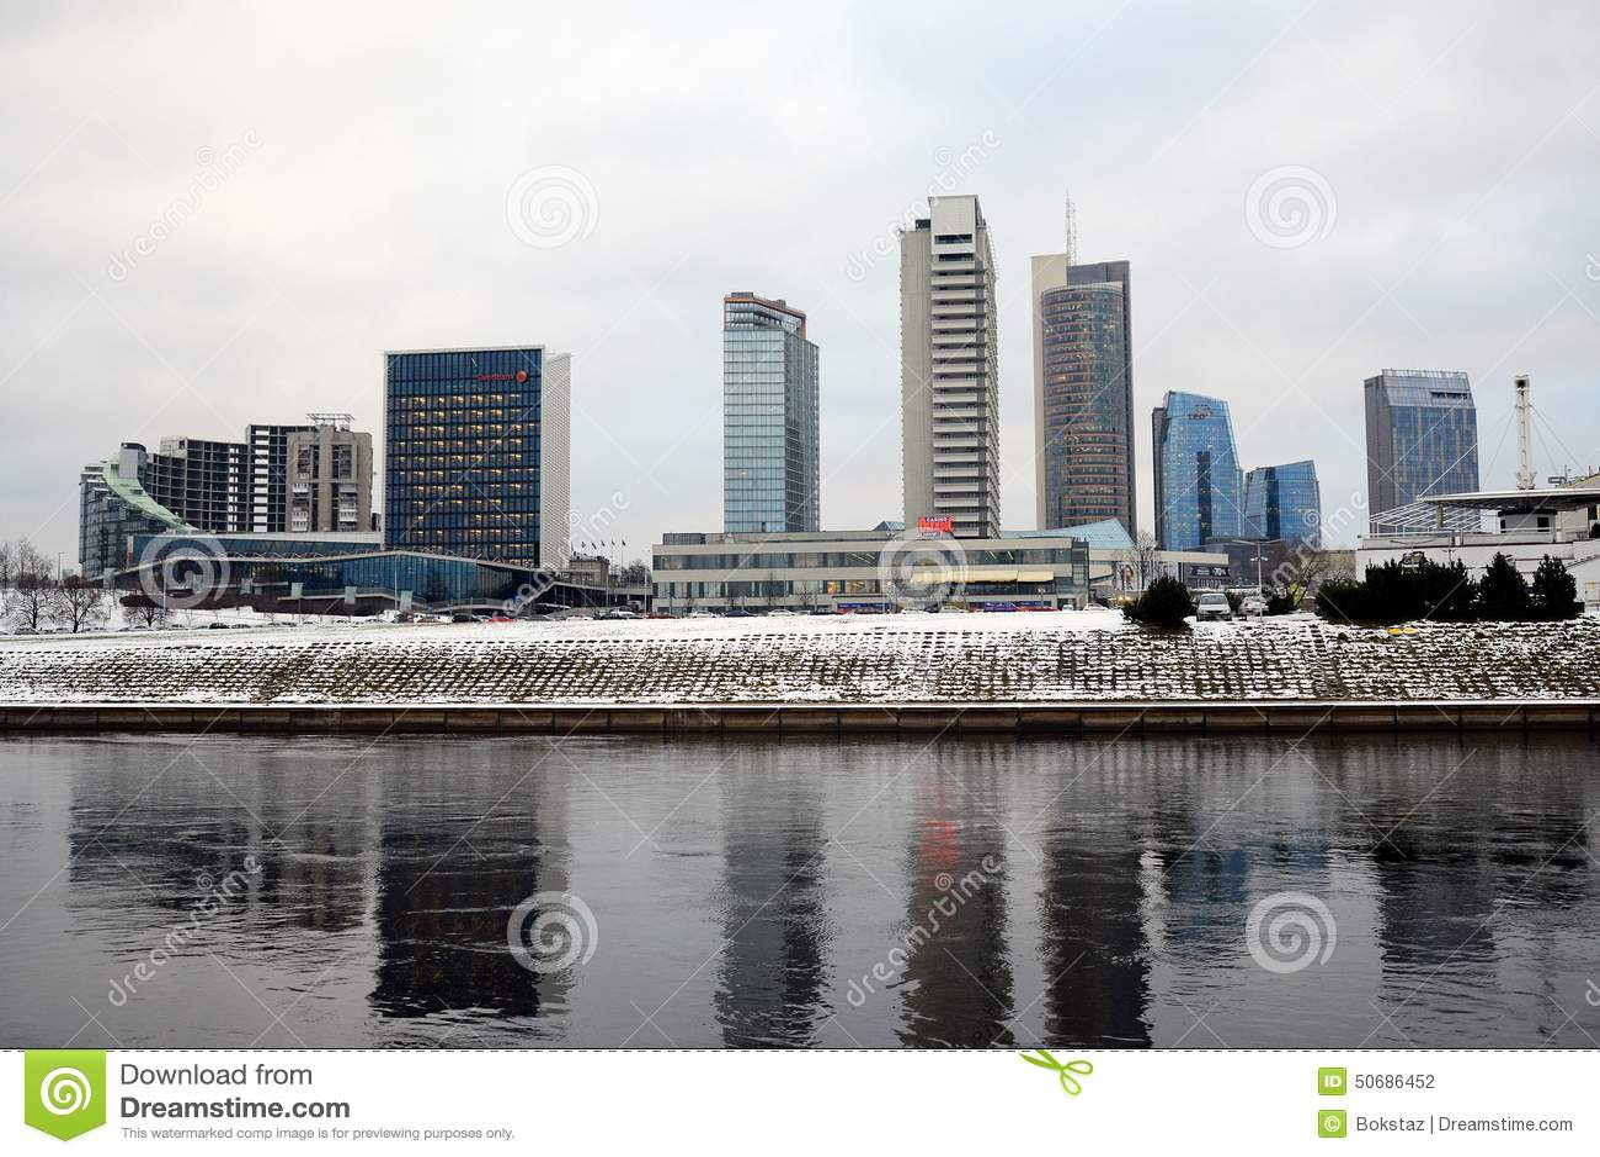 Download 维尔纽斯有摩天大楼的冬天全景涅里斯河河委员会的 图库摄影片. 图片 包括有 属性, 办公室, 庄园, 总公司 - 50686452